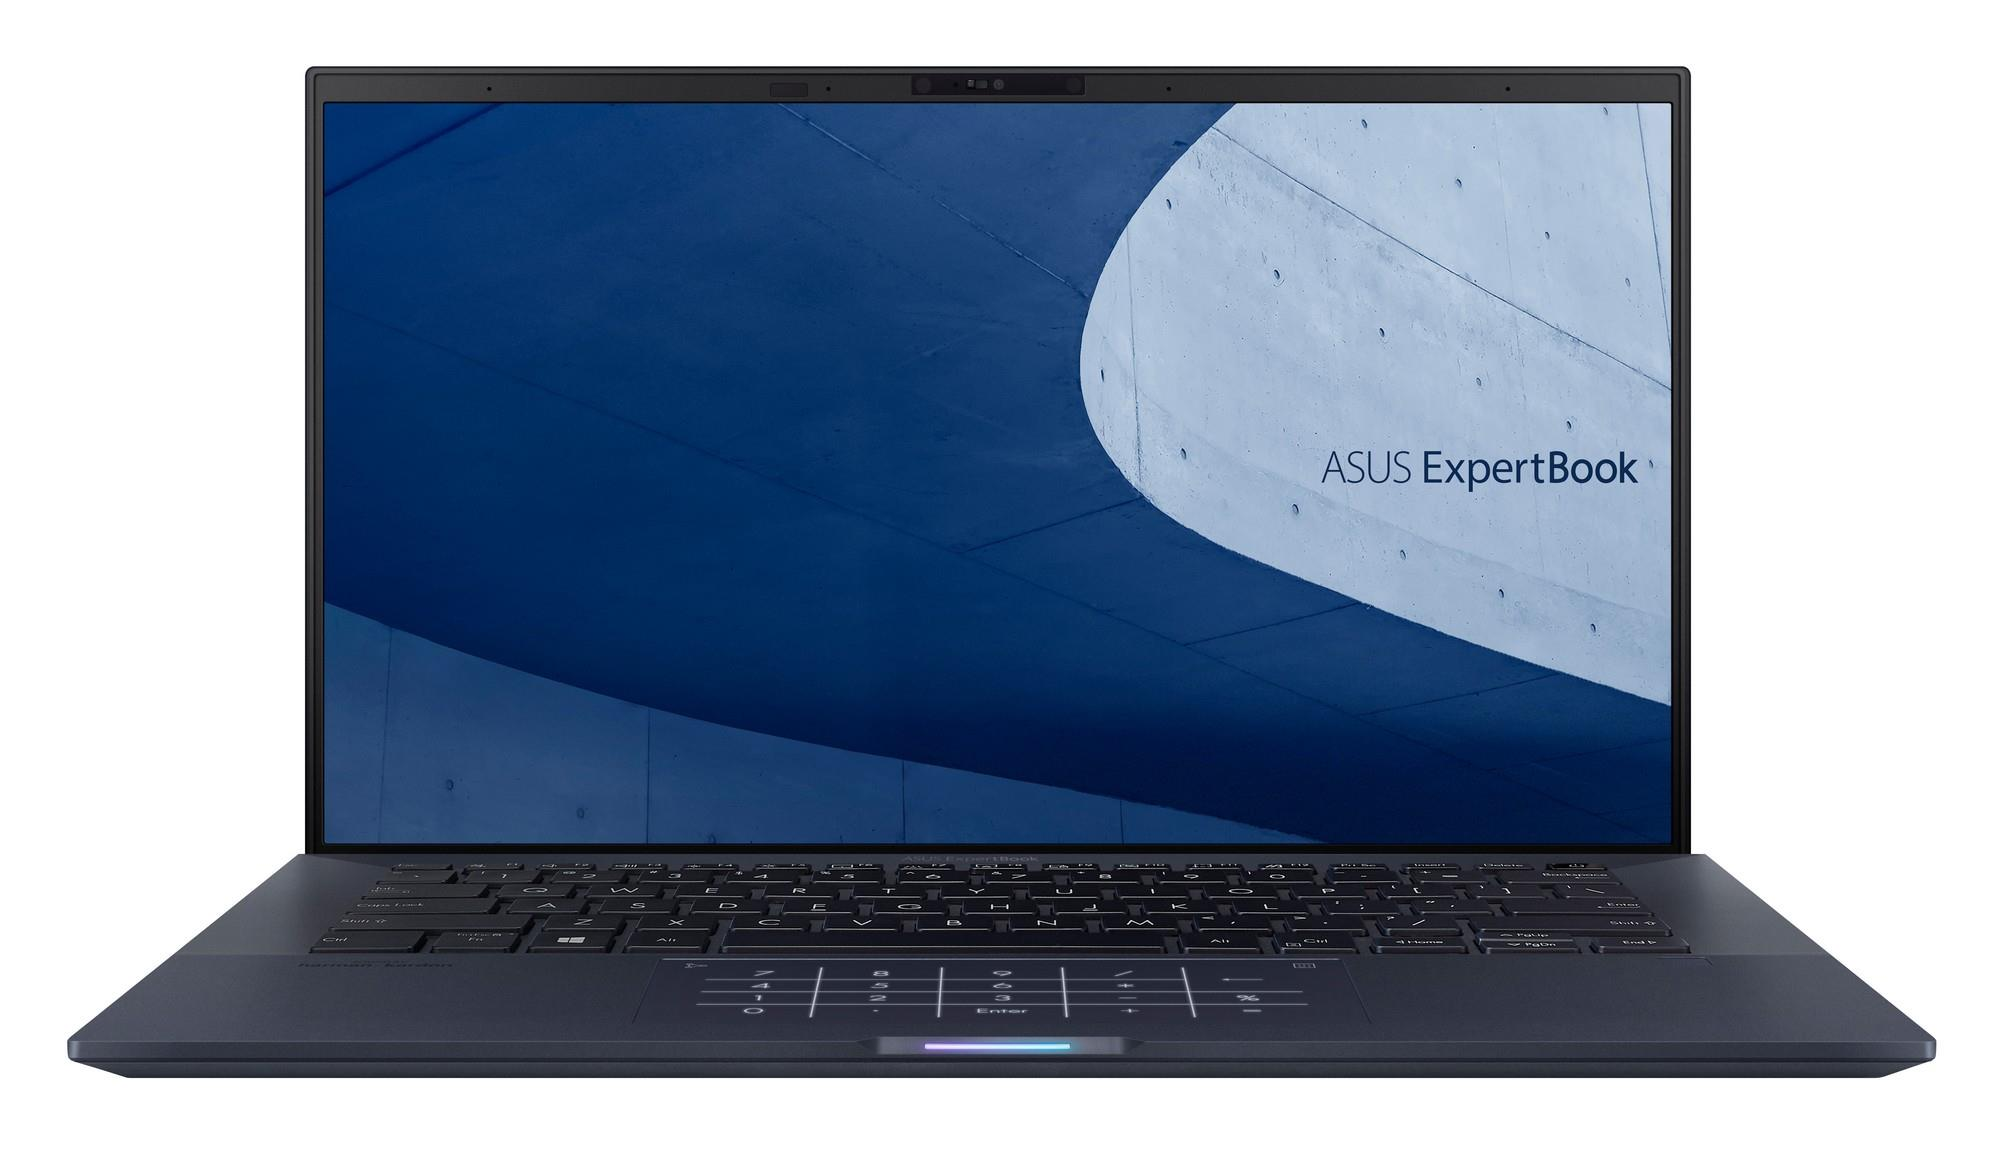 ASUS ExpertBook B9400/14''/i7-1165G7 (4C/8T)/16GB/1TB SSD/FPR/TPM/W10P/Black/2Y PUR